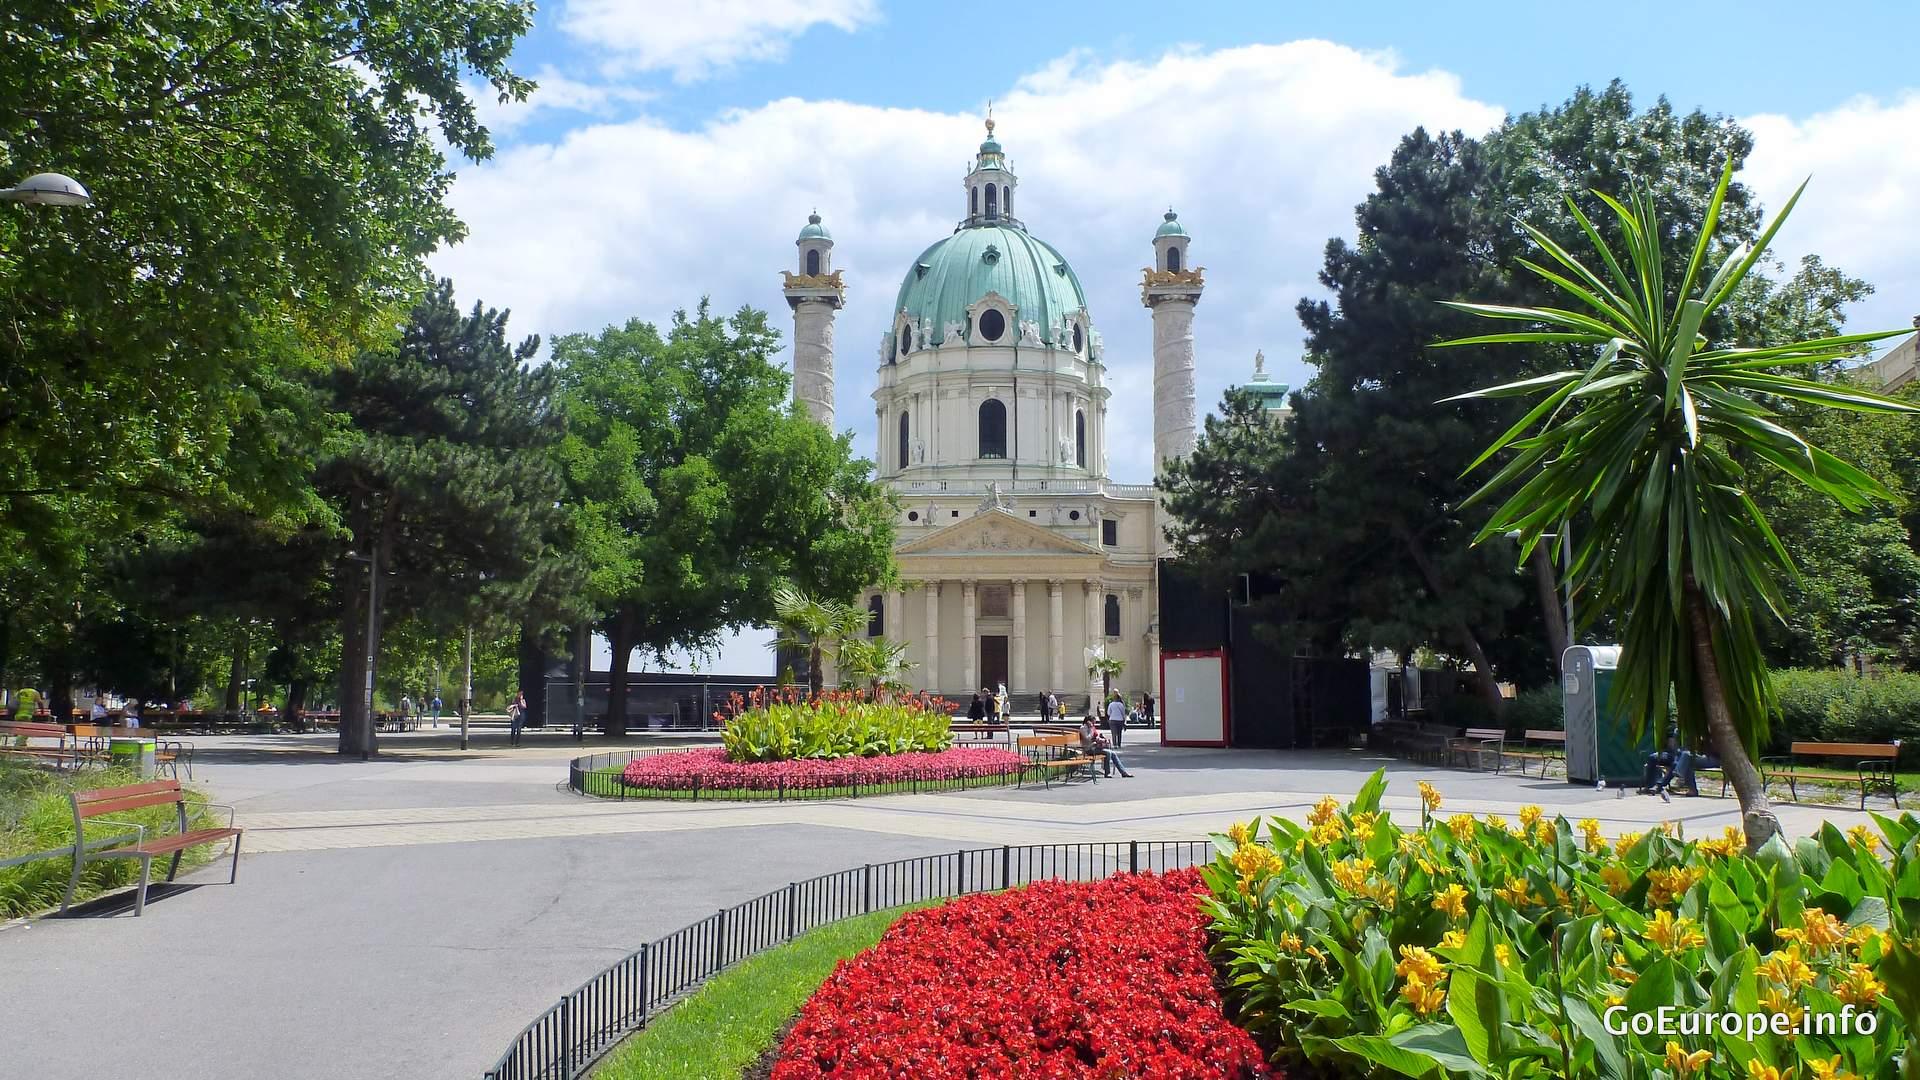 Visit Austria Goeurope Info